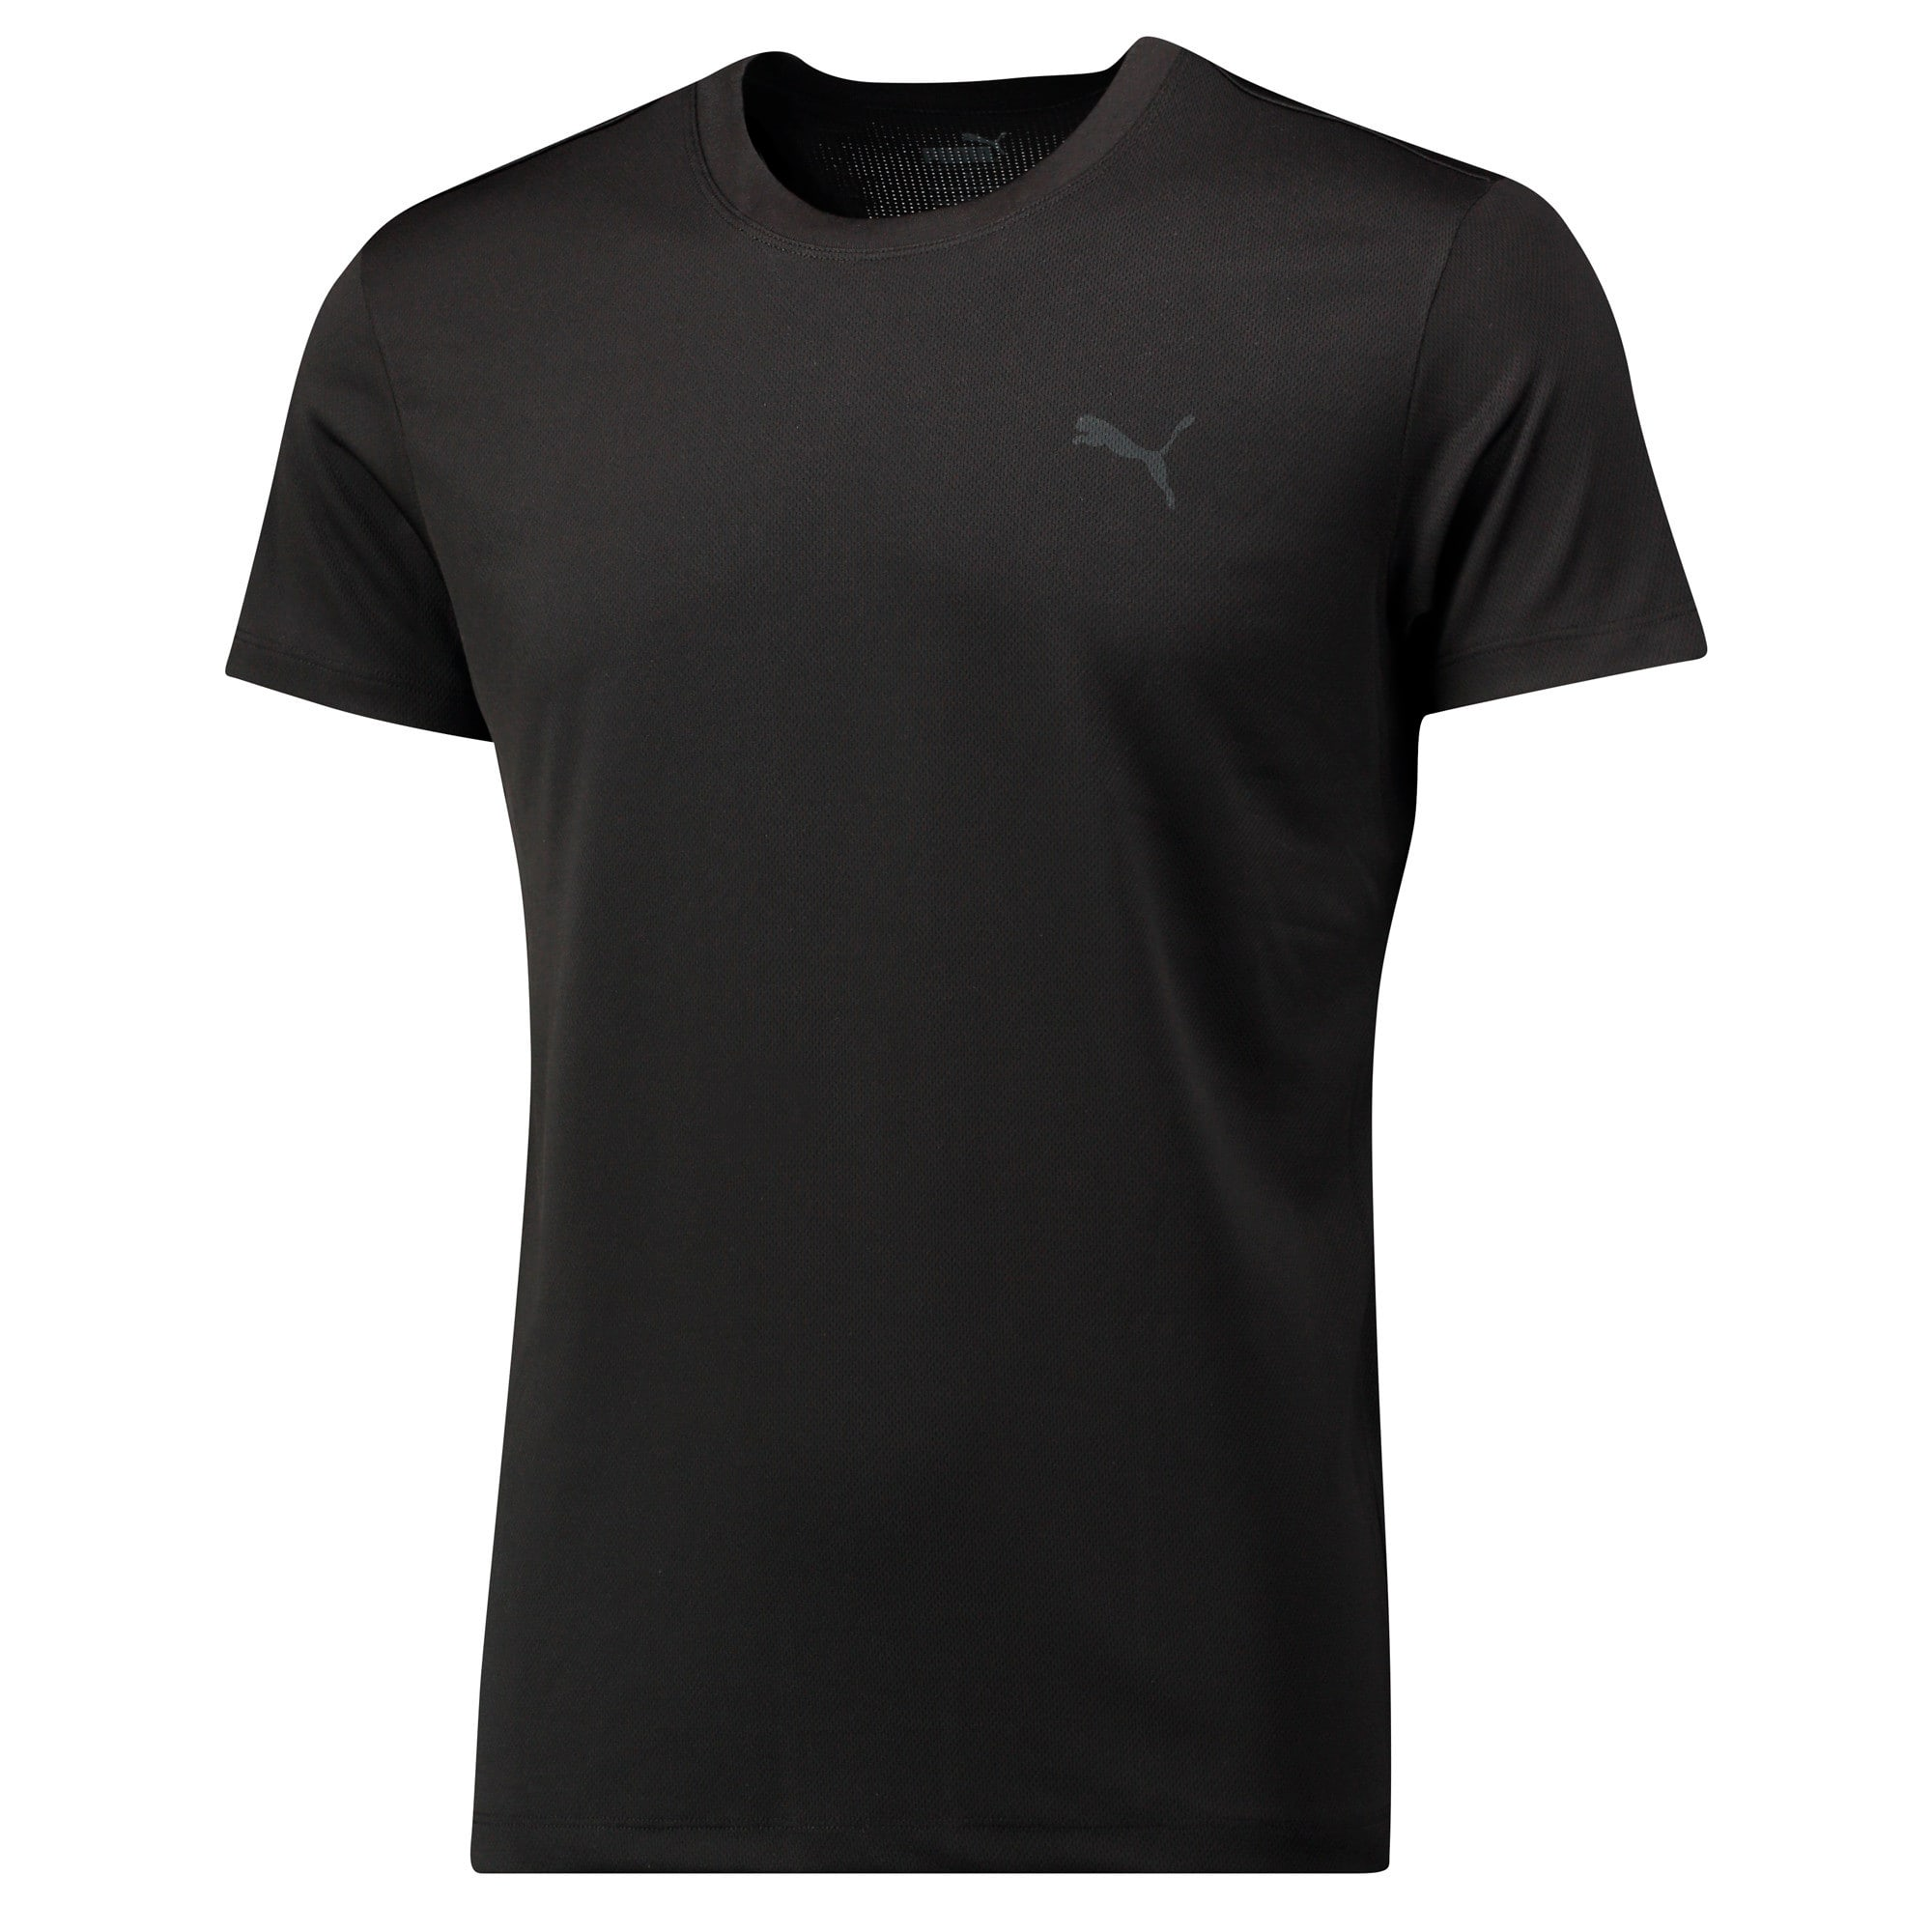 Thumbnail 3 of Active Men's Cree T-Shirt, black, medium